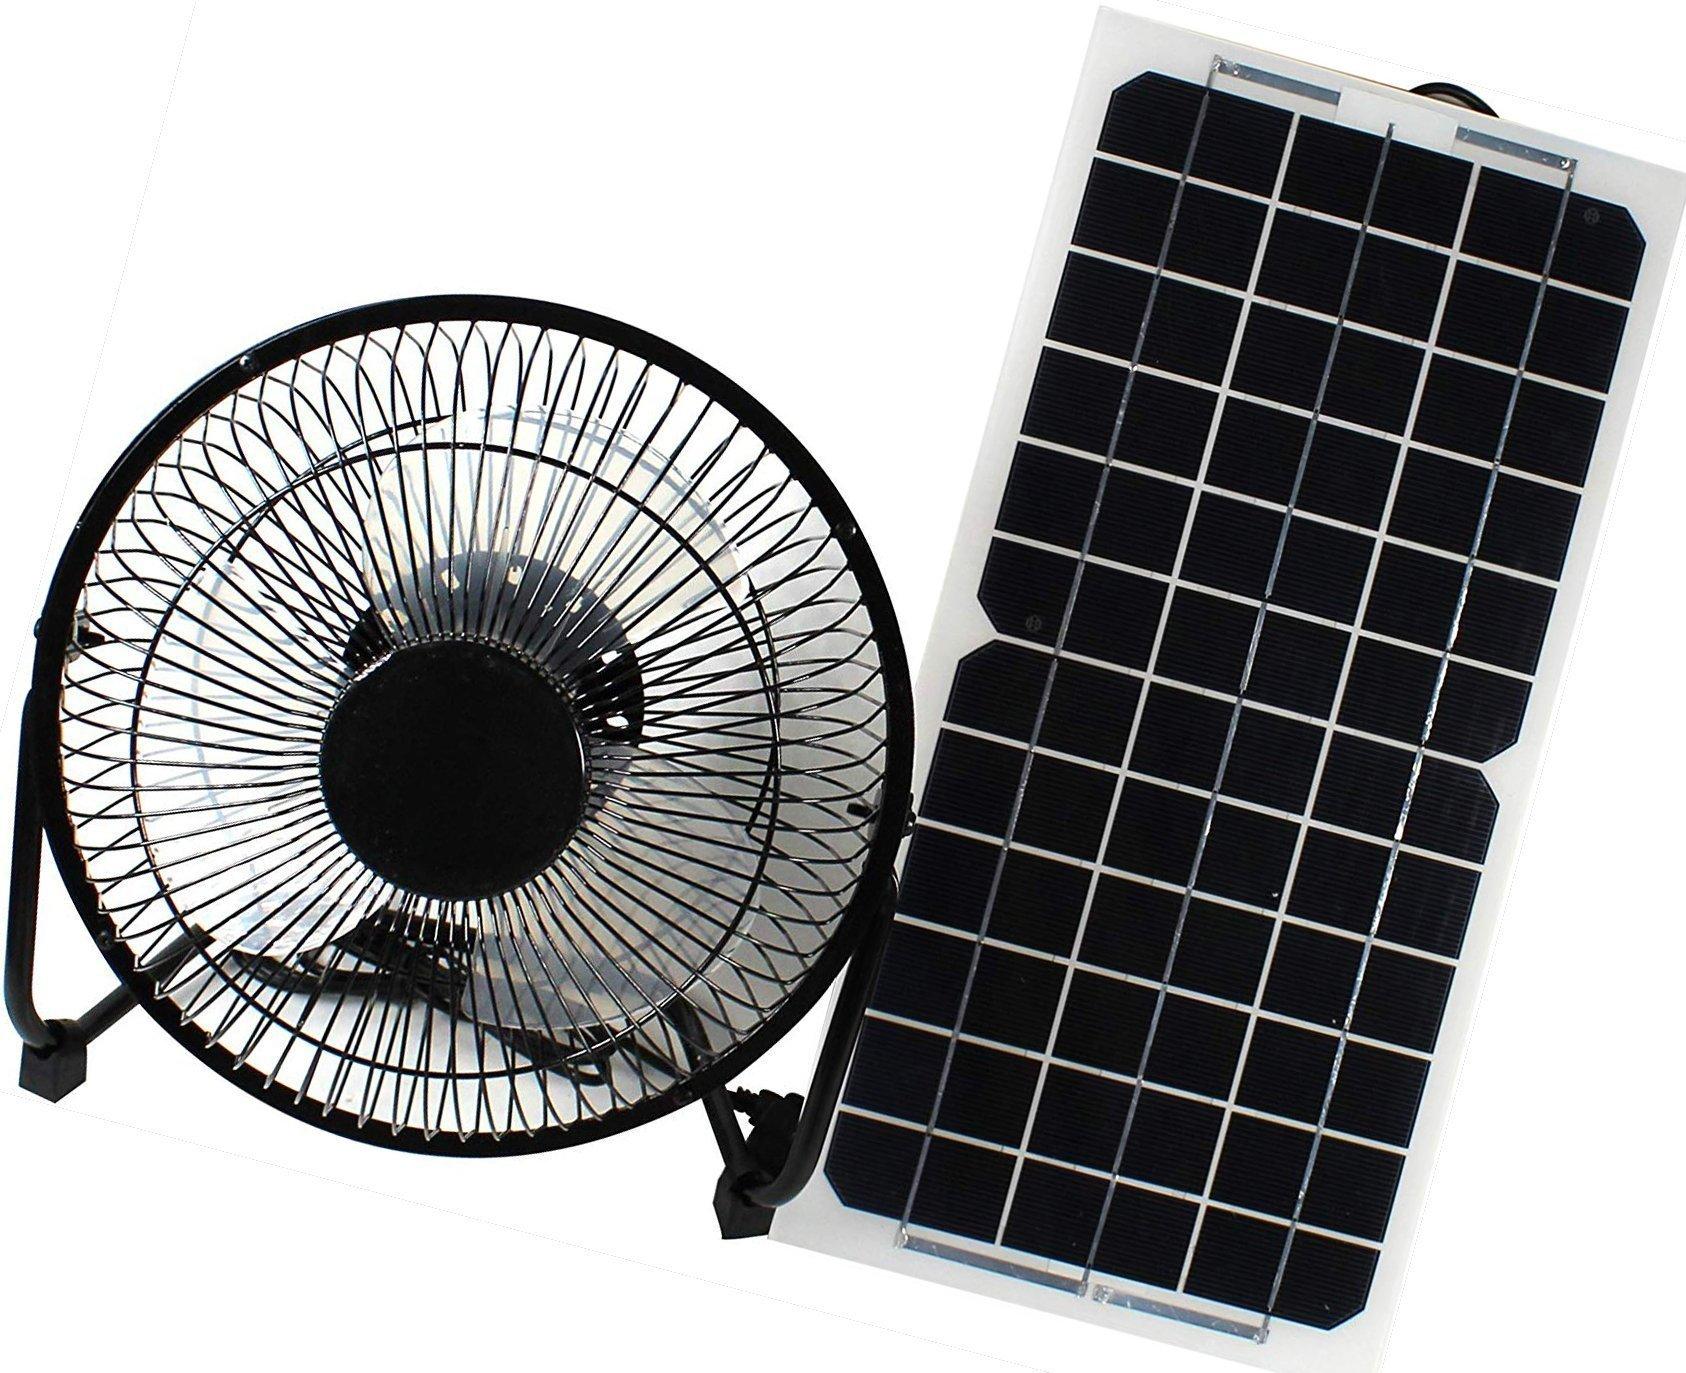 solar panel powered fan ventilator for rv by goodsoz